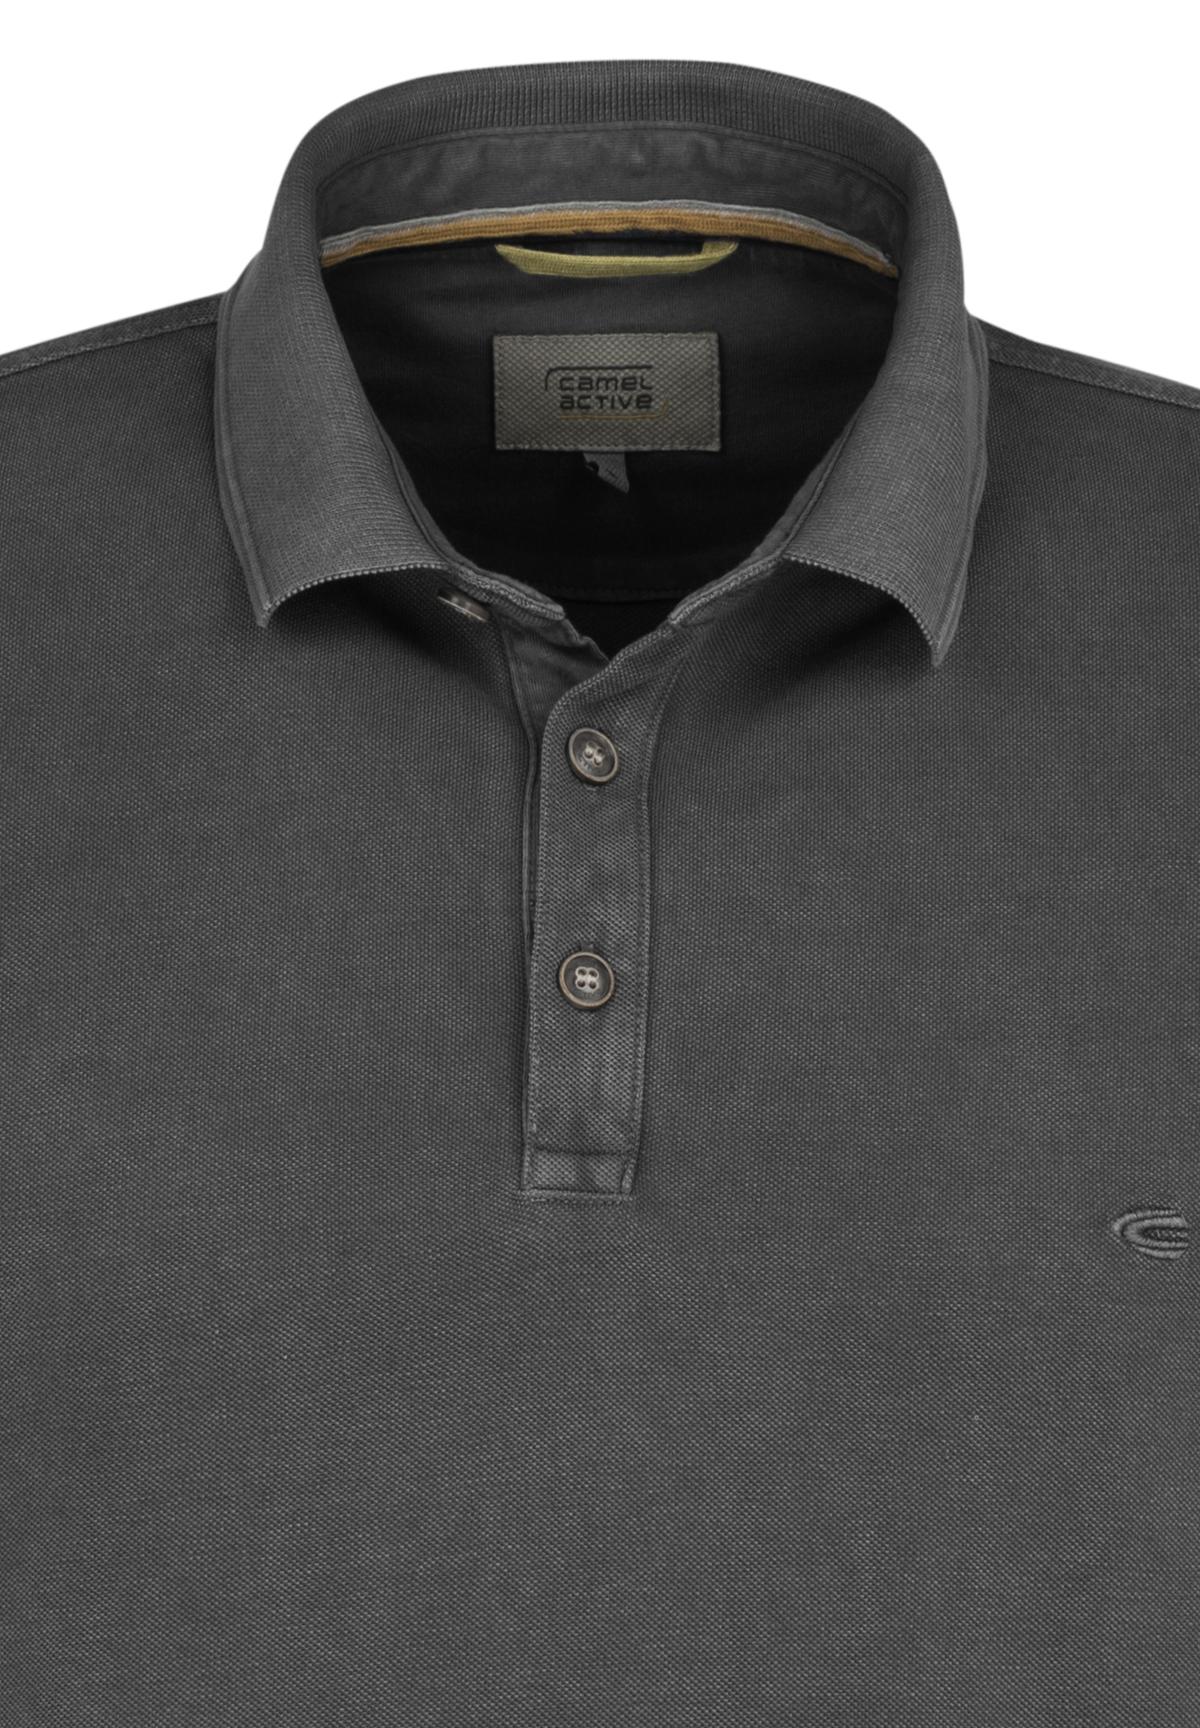 Camel-Active-Herren-Shirt-Poloshirt-Pique-Regular-Fit-NEU Indexbild 50